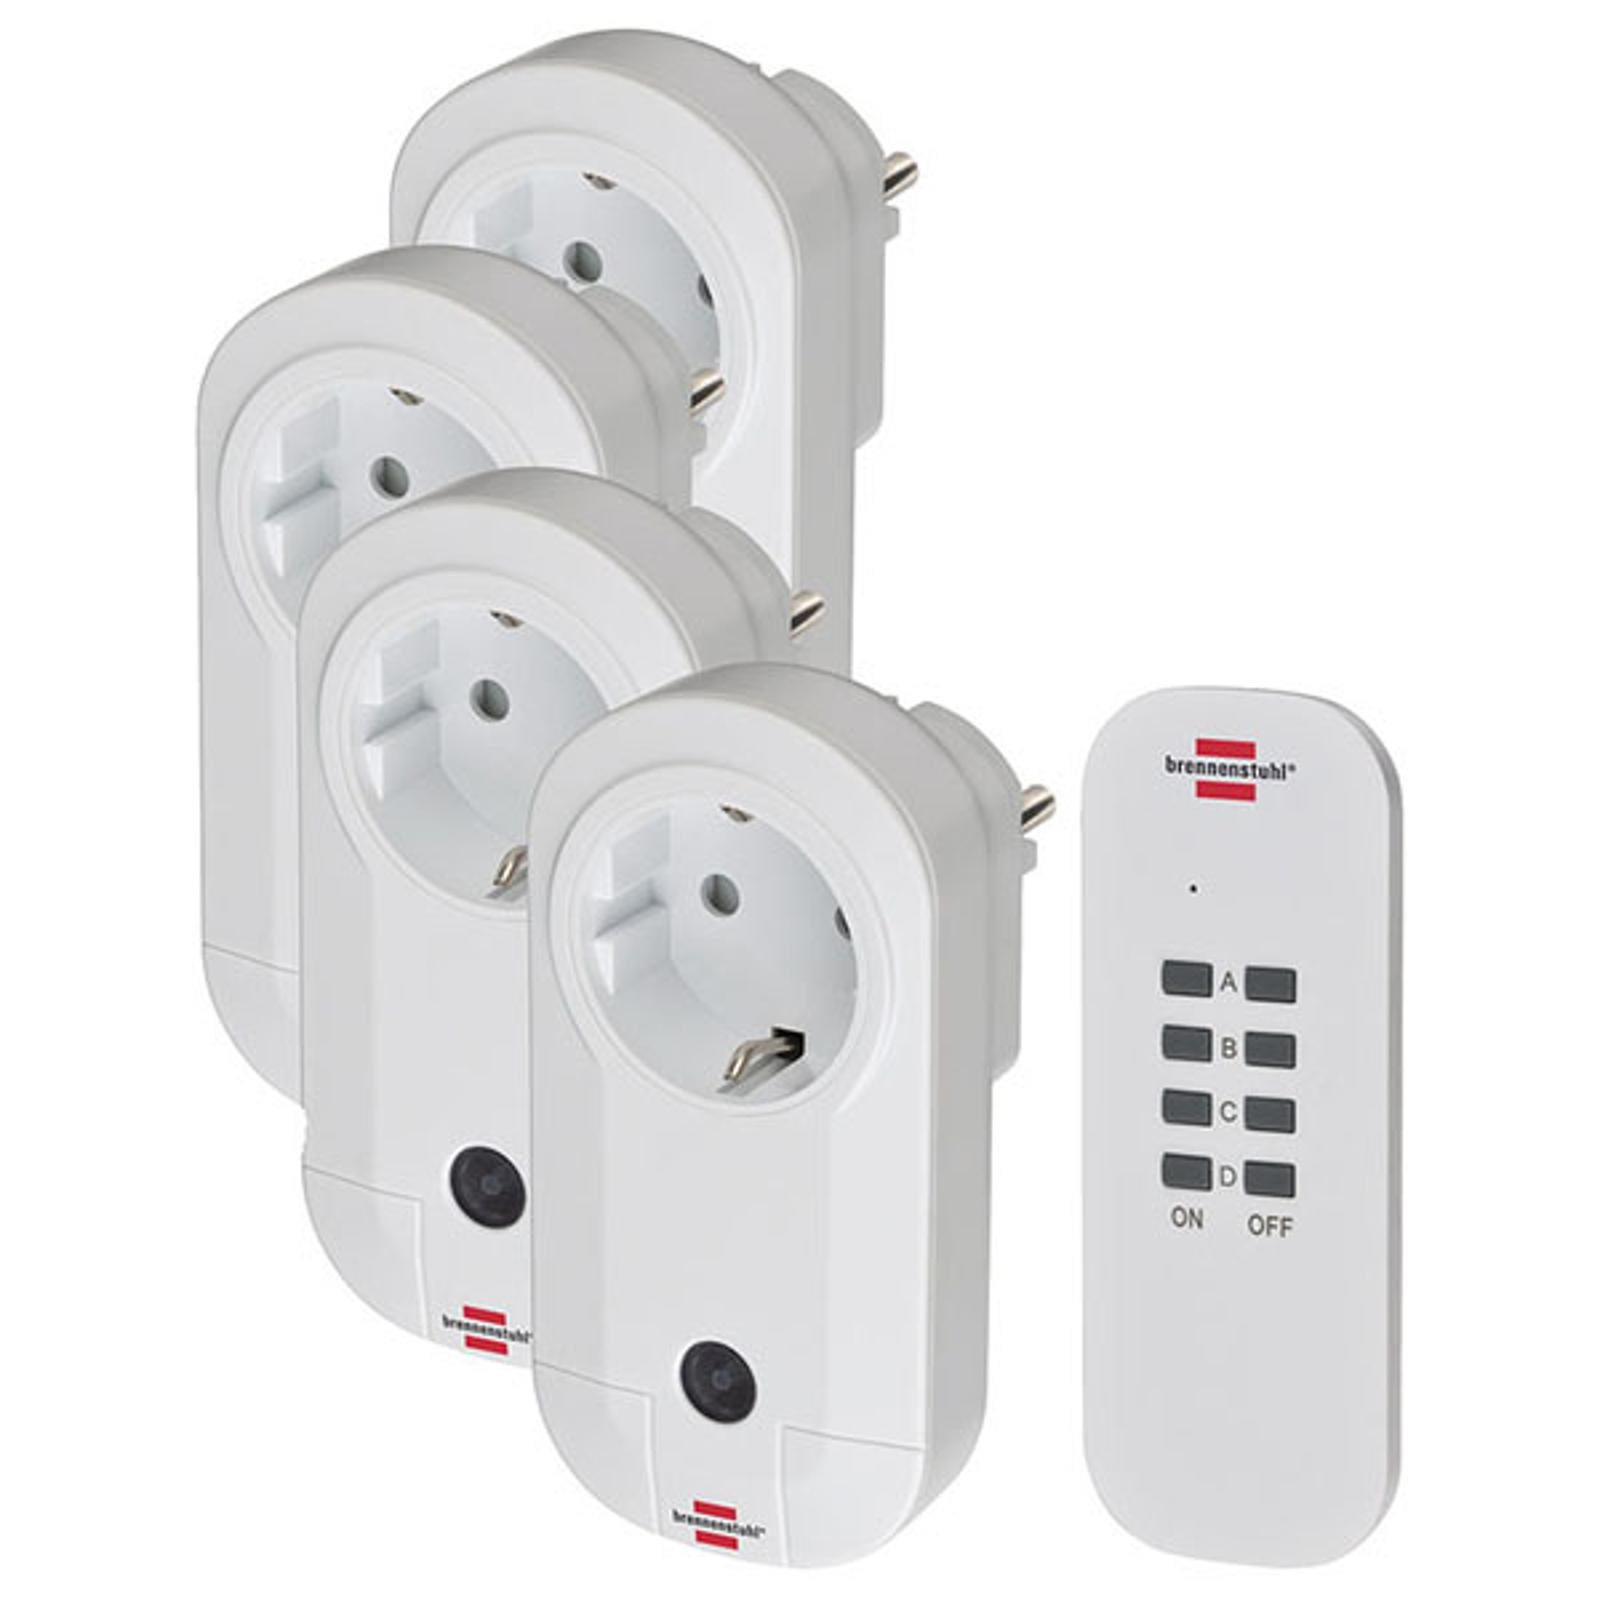 Comfort-Line RC CE1 4001 4xIP20 trådl. stikdåsesæt